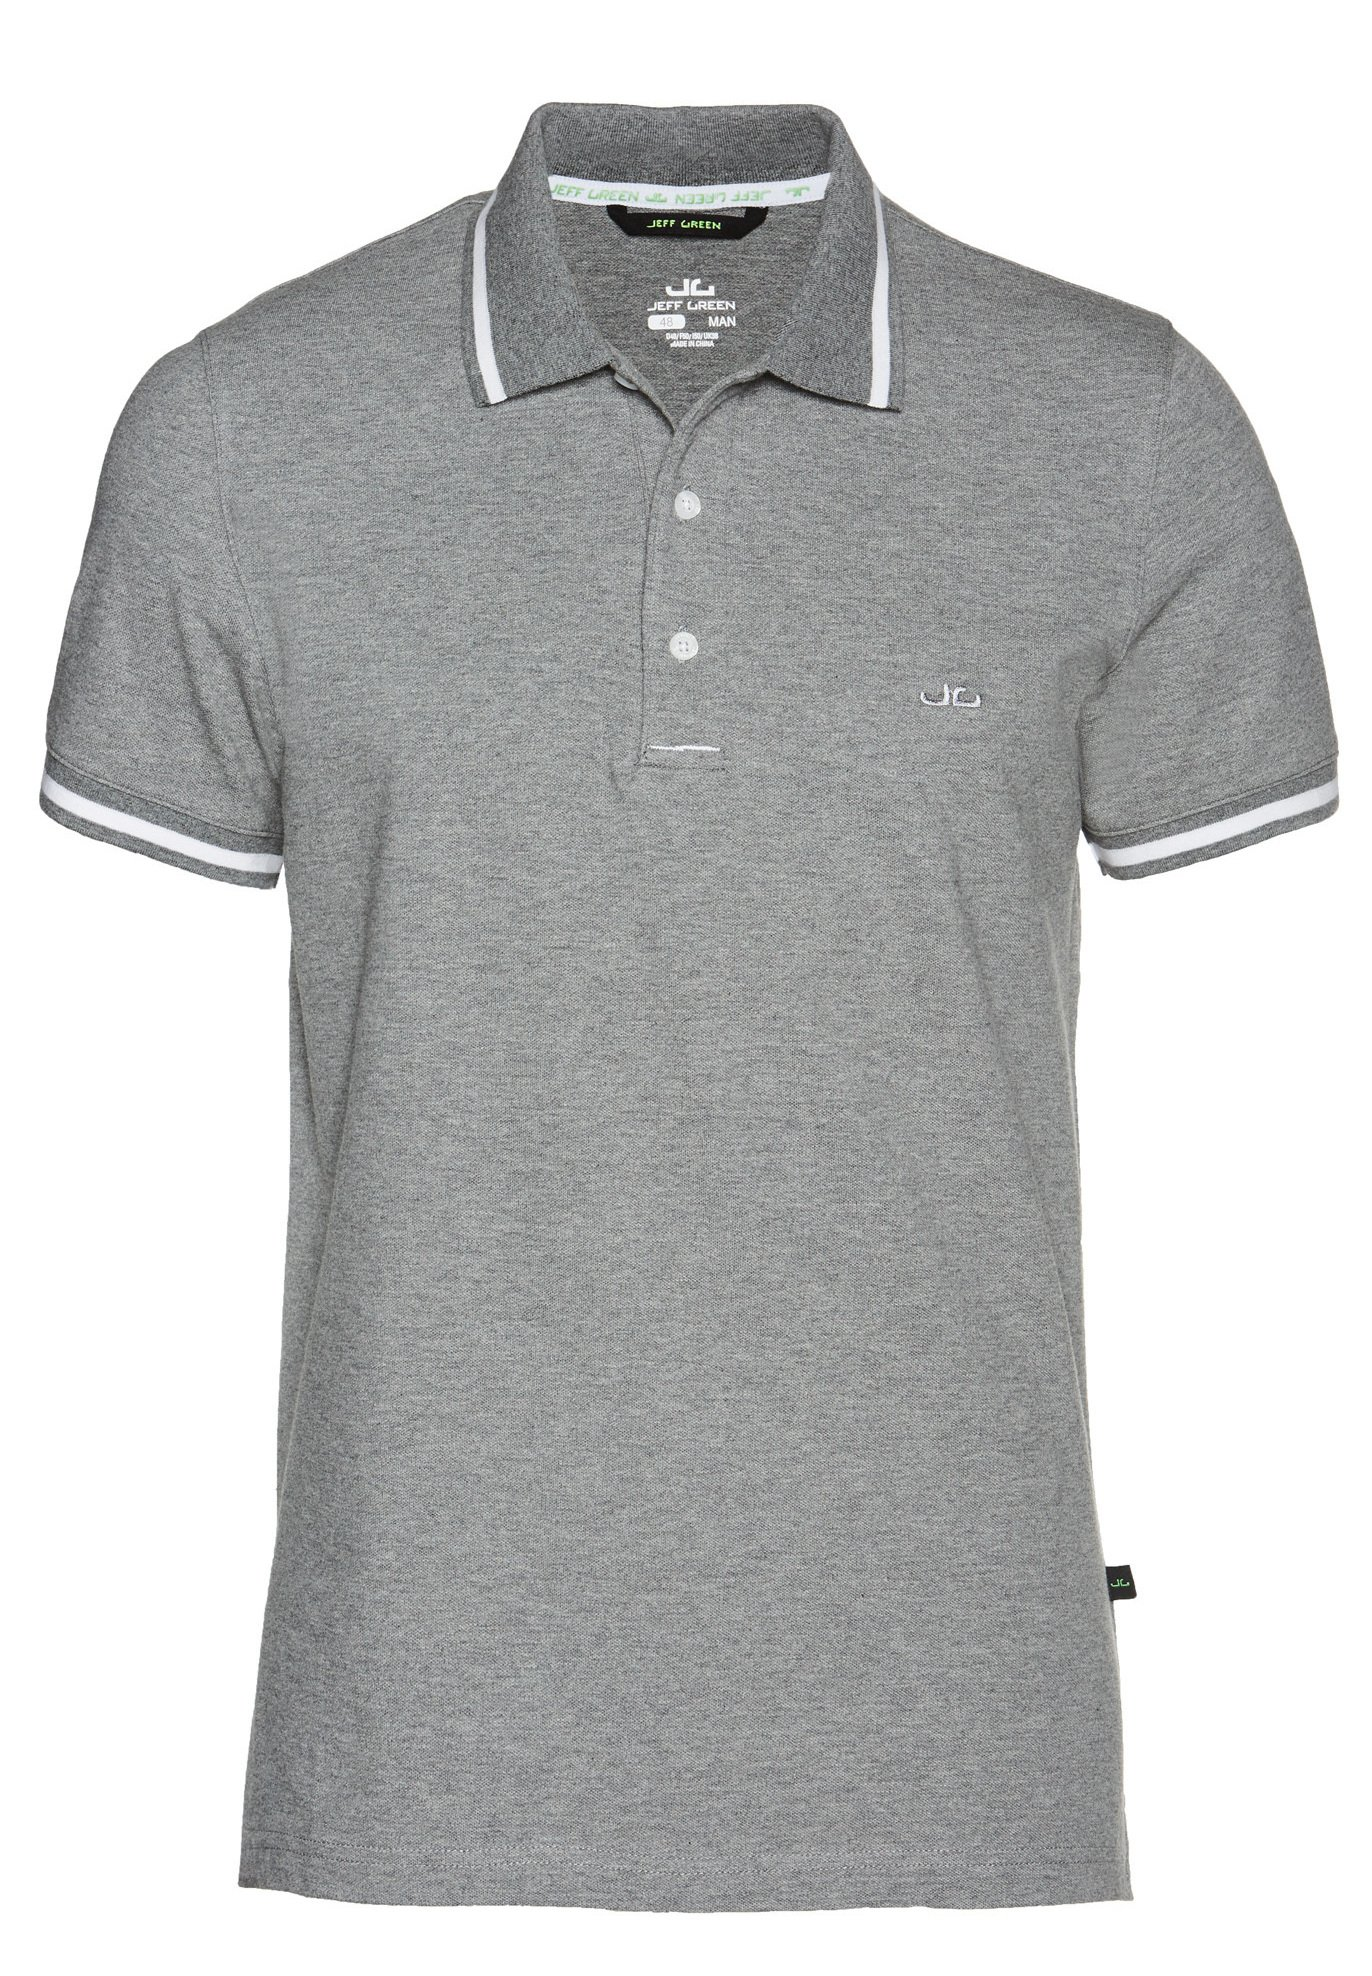 Jeff Green Poloshirt - dark grey  Heren shirts HmfI4